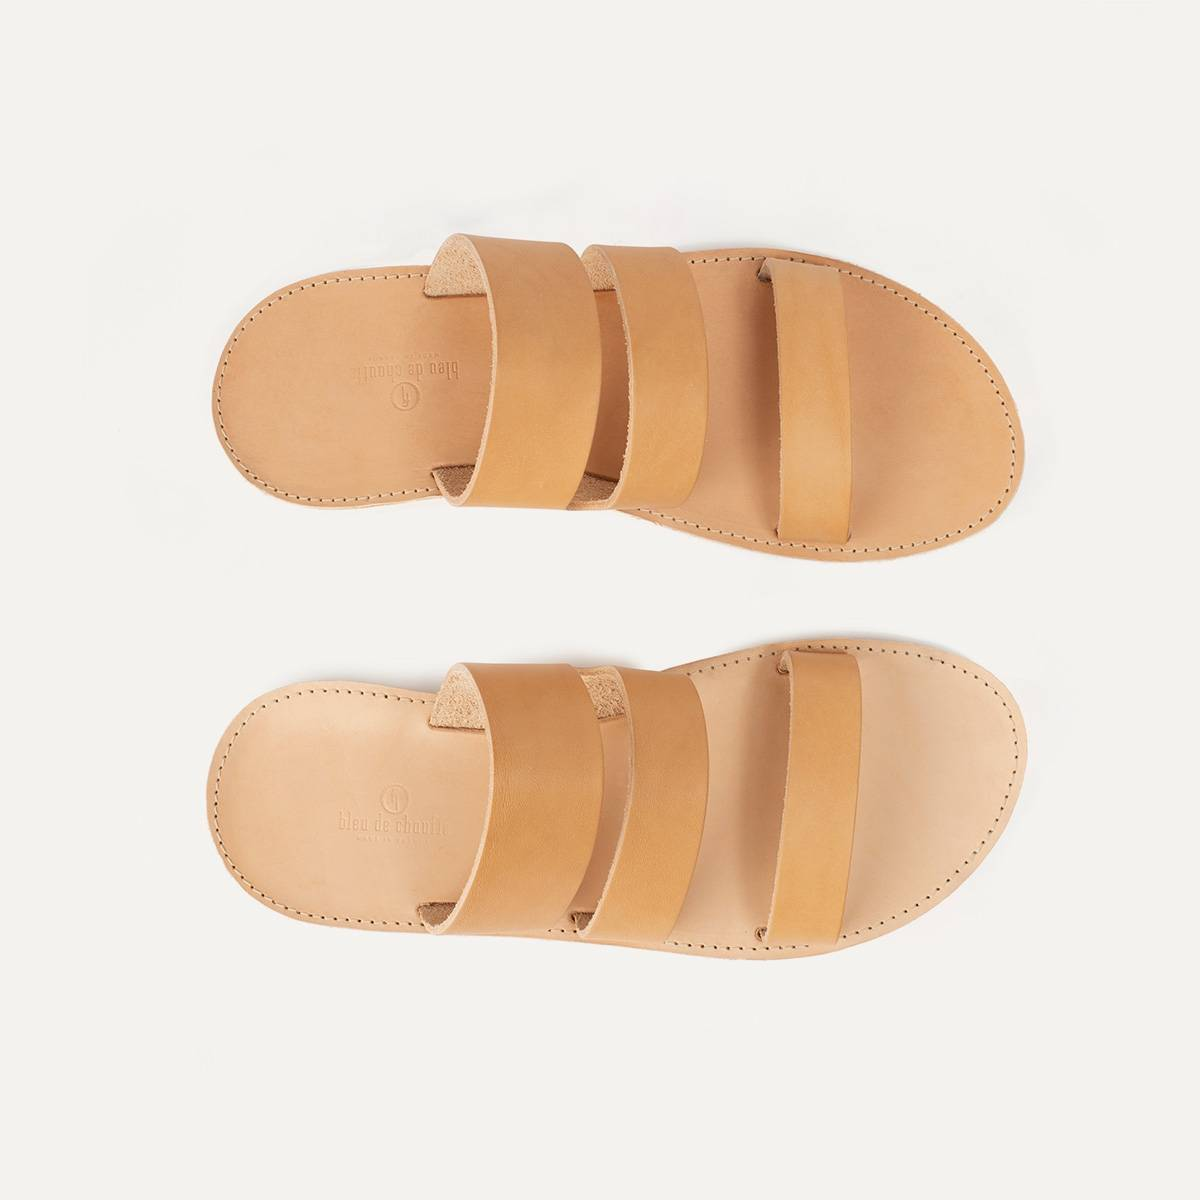 Cuir Sandales Made In Homme Chauffe De FranceBleu NwPZOX8n0k